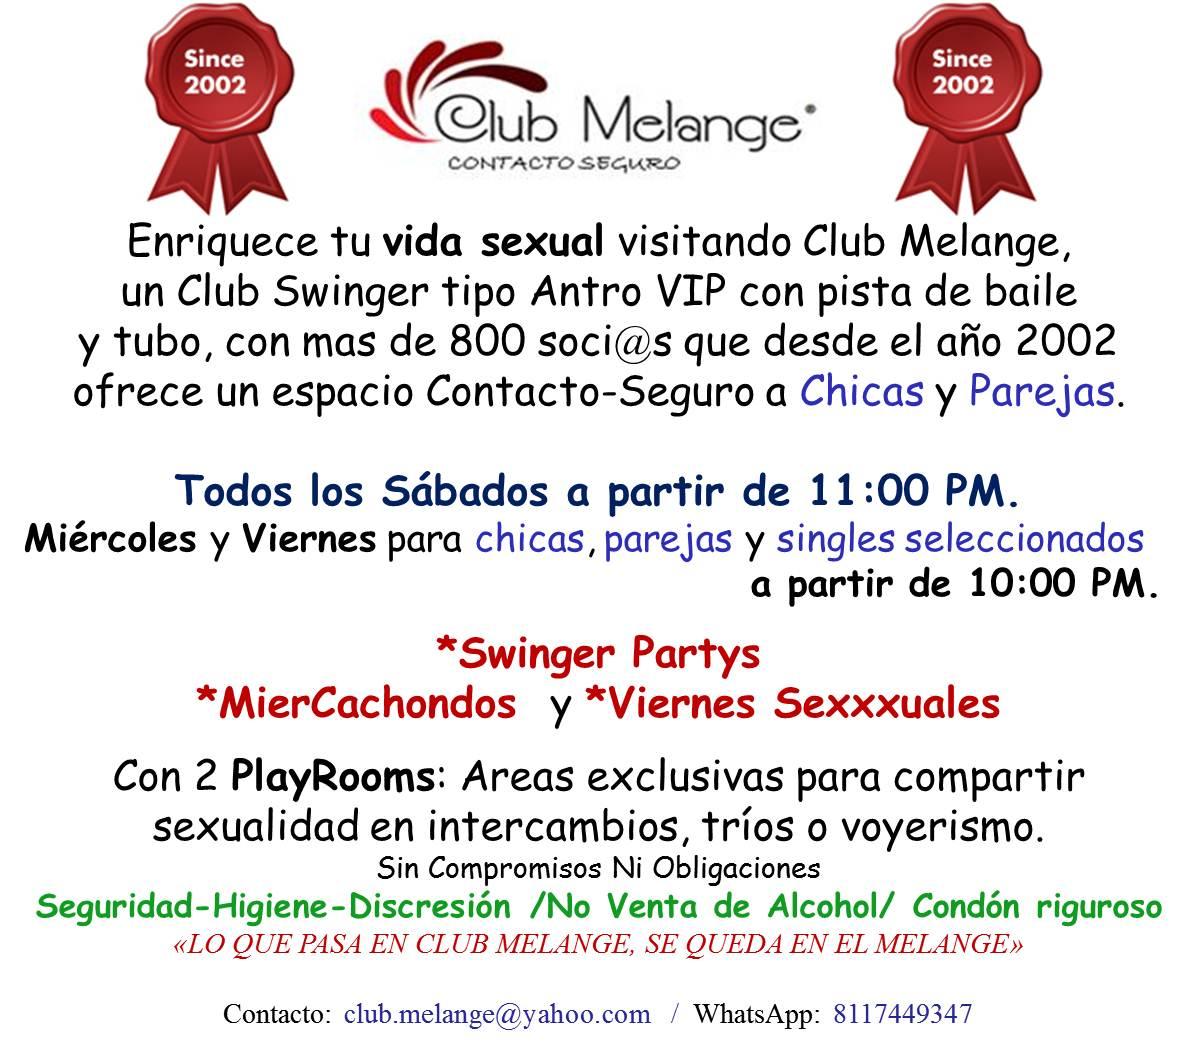 Club Melange (@ClubMelange): http://t.co/aLvnqPMKBB